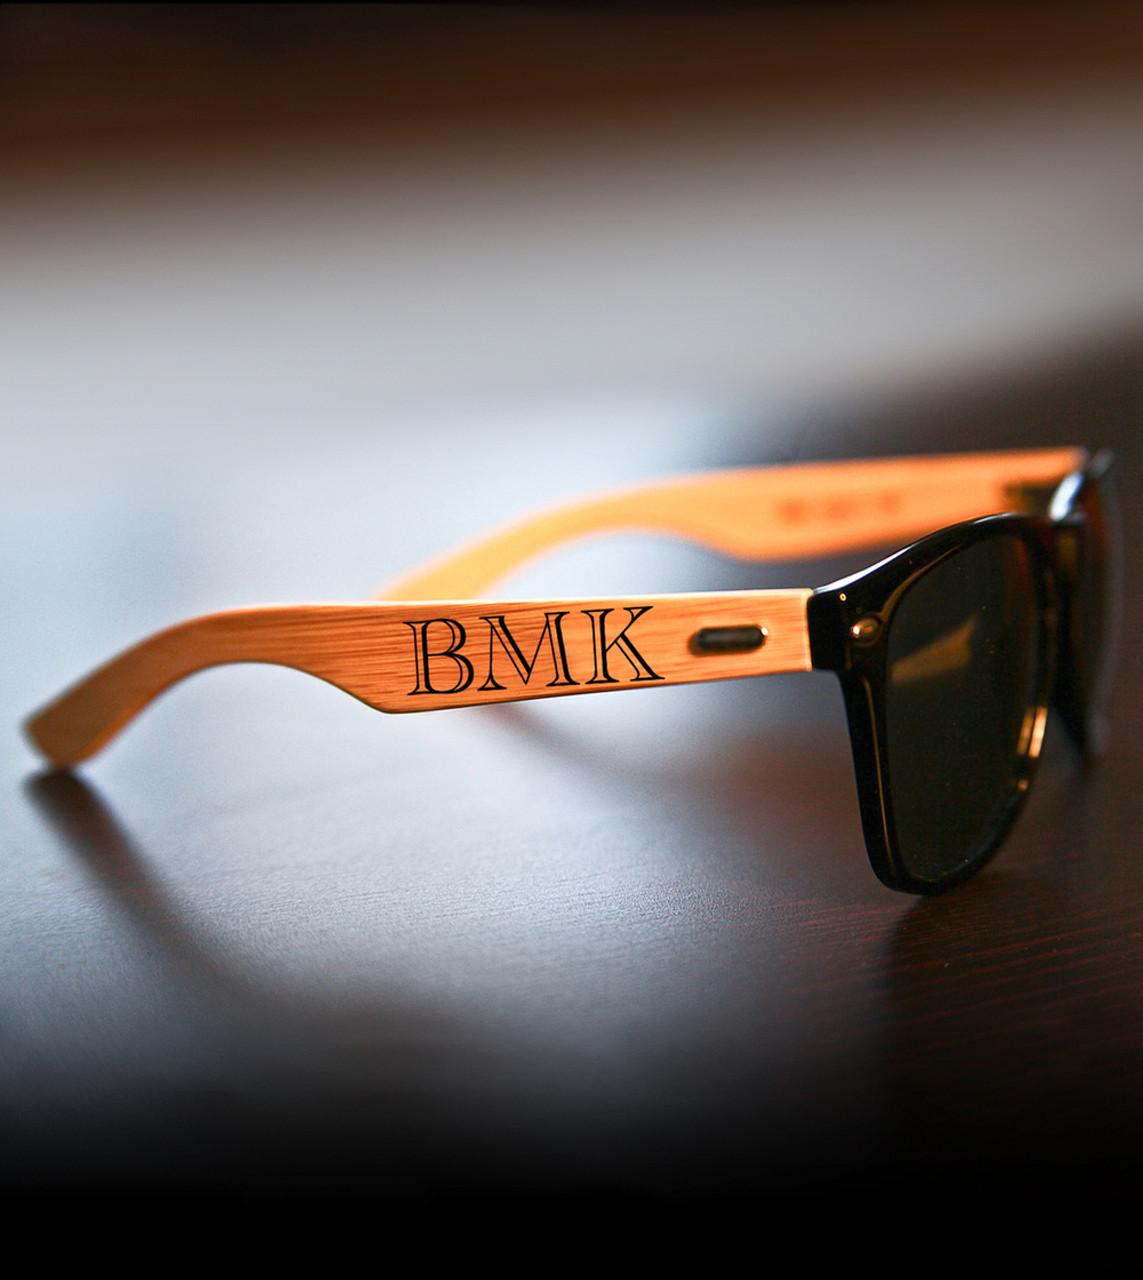 Personalized Bamboo Sunglasses - IMPRINT Monogram